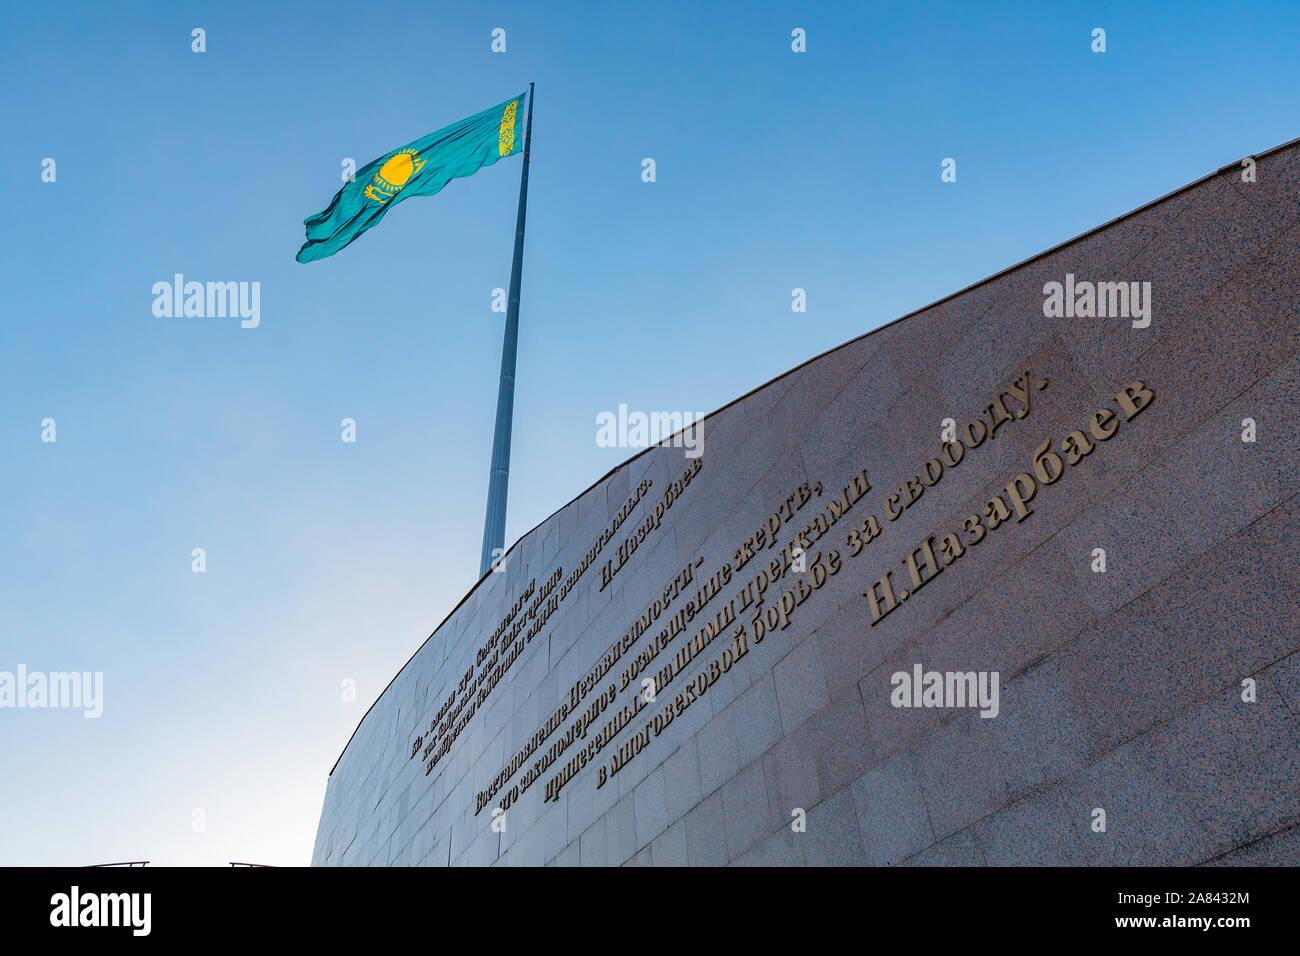 Nur-Sultan Astana Central City Tsentralnyy Gorodskoy Park View of Waving Kazakhstan Flag on a Sunny Blue Sky Day Stock Photo